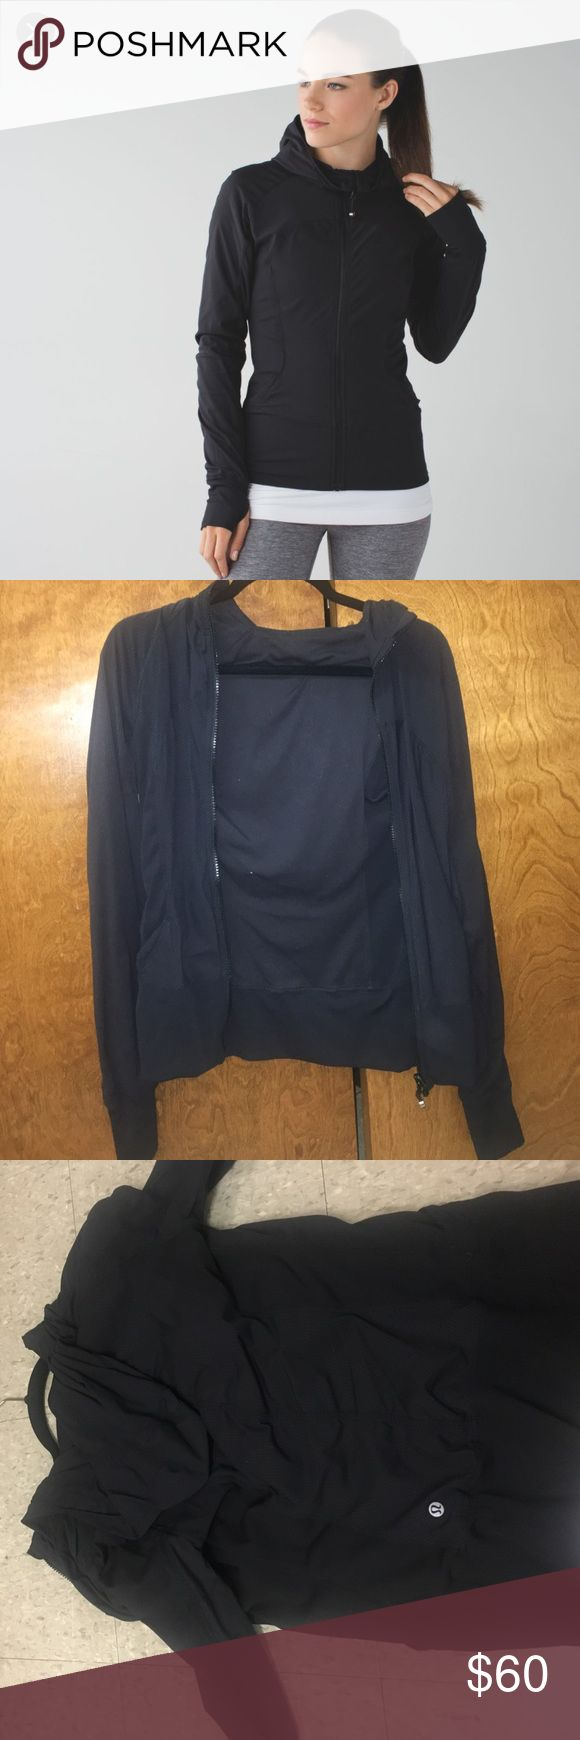 Lululemon In Flux Black reversible Lulu jacket. Worn maybe 3 times. Perfect condition! Size 8 lululemon athletica Jackets & Coats